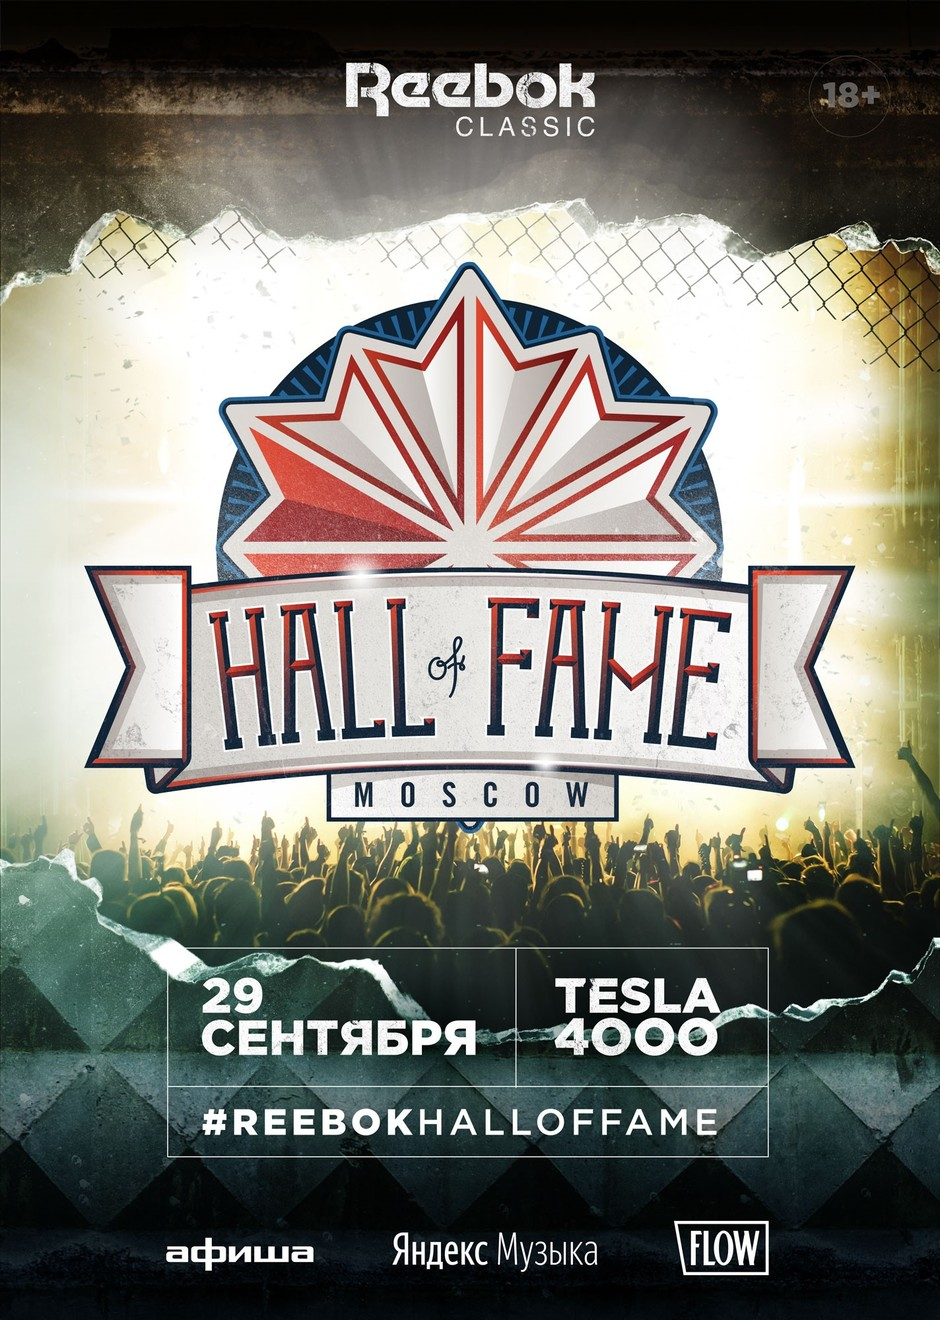 Reebok закатывает грандиозную вечеринку Hall of Fame